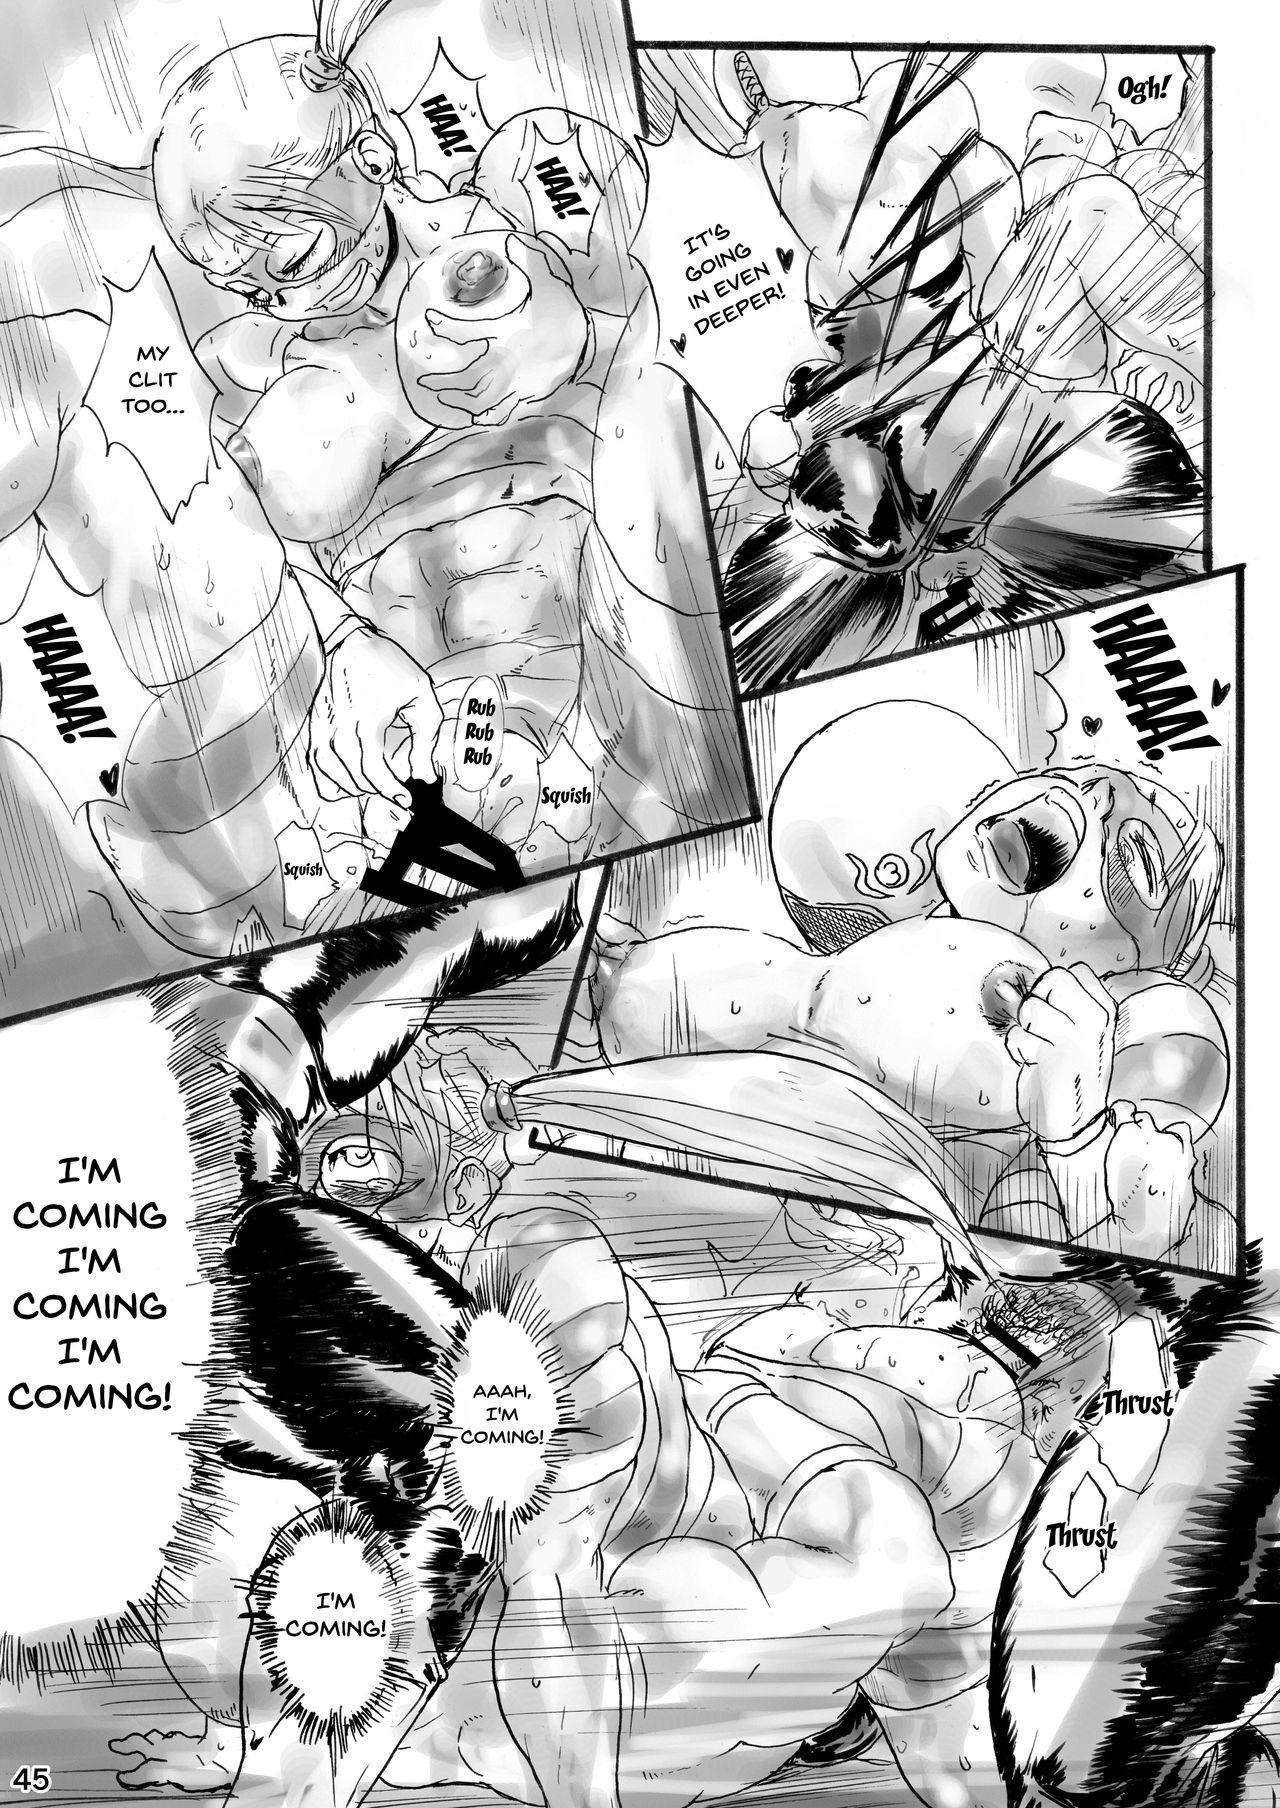 [POWERPLAY (Various)] CAPCOM (& MORE!) VS FIGHTING GIRLS Swimsuit & Gangbang Special (Various) [English] {Doujins.com} [Digital] 41